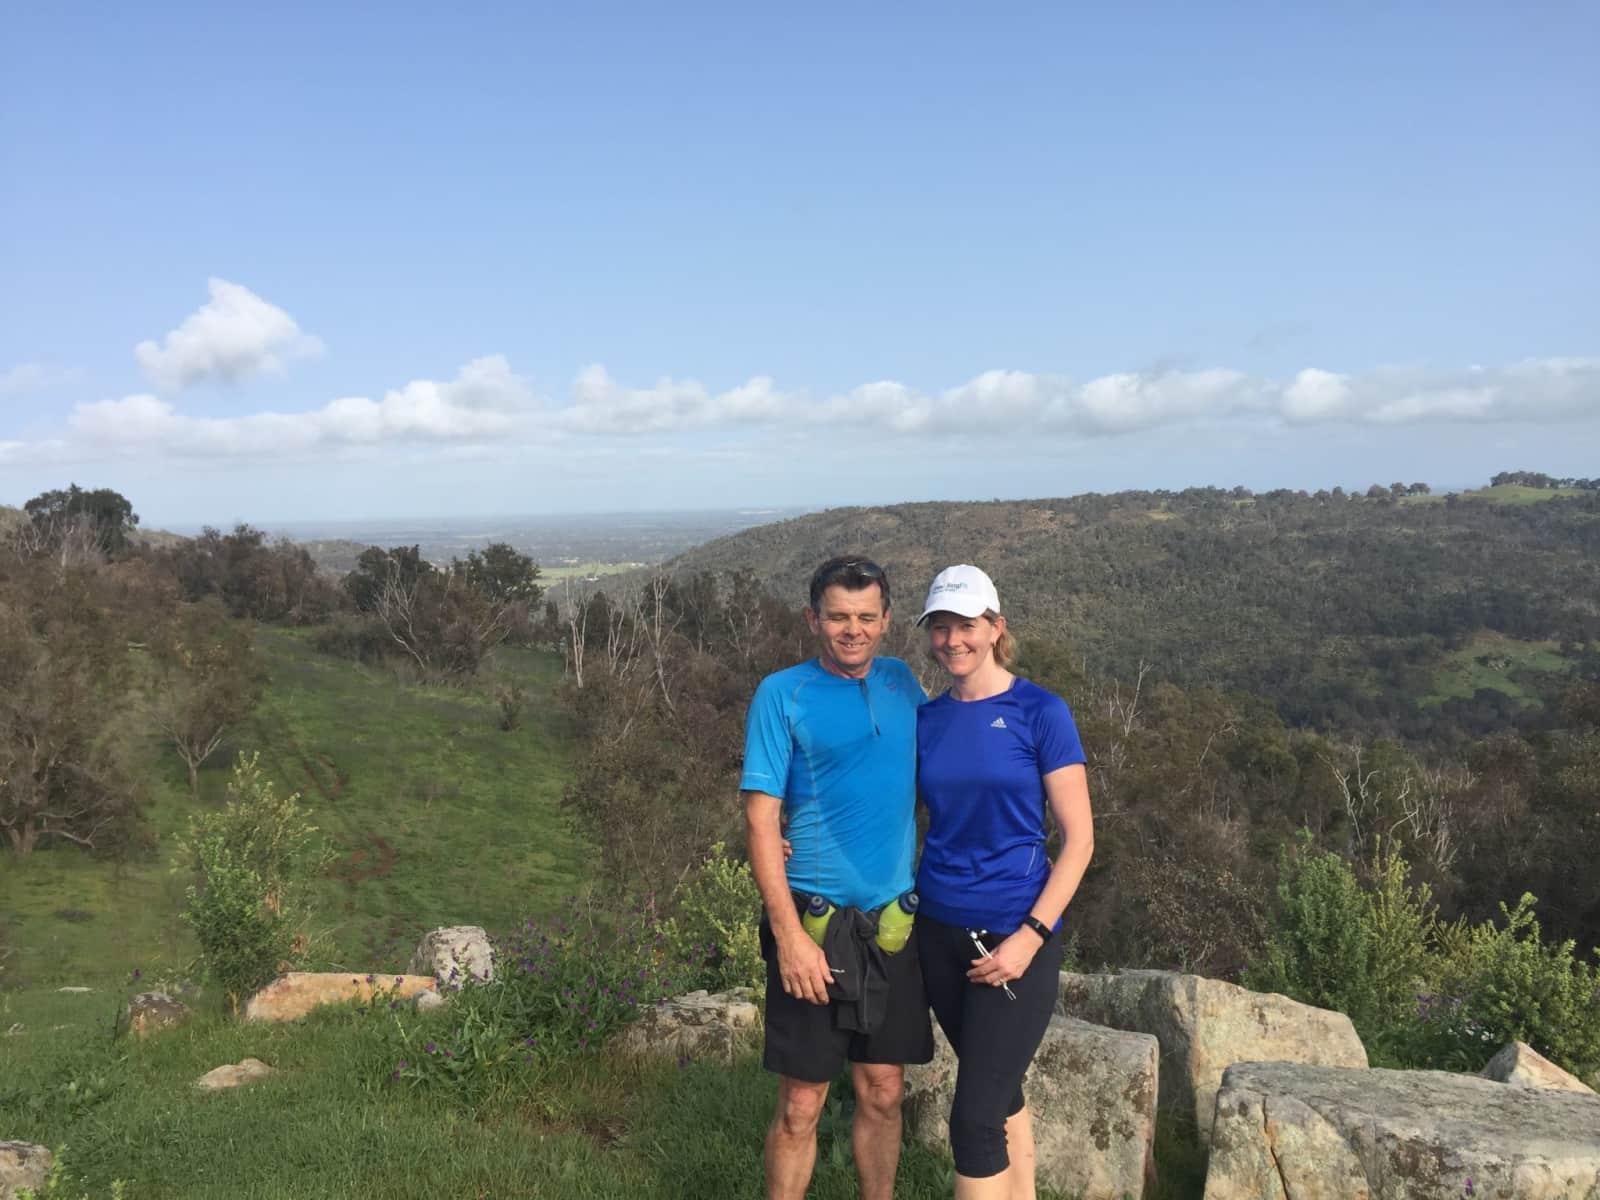 Danielle & Peter from Perth, Western Australia, Australia